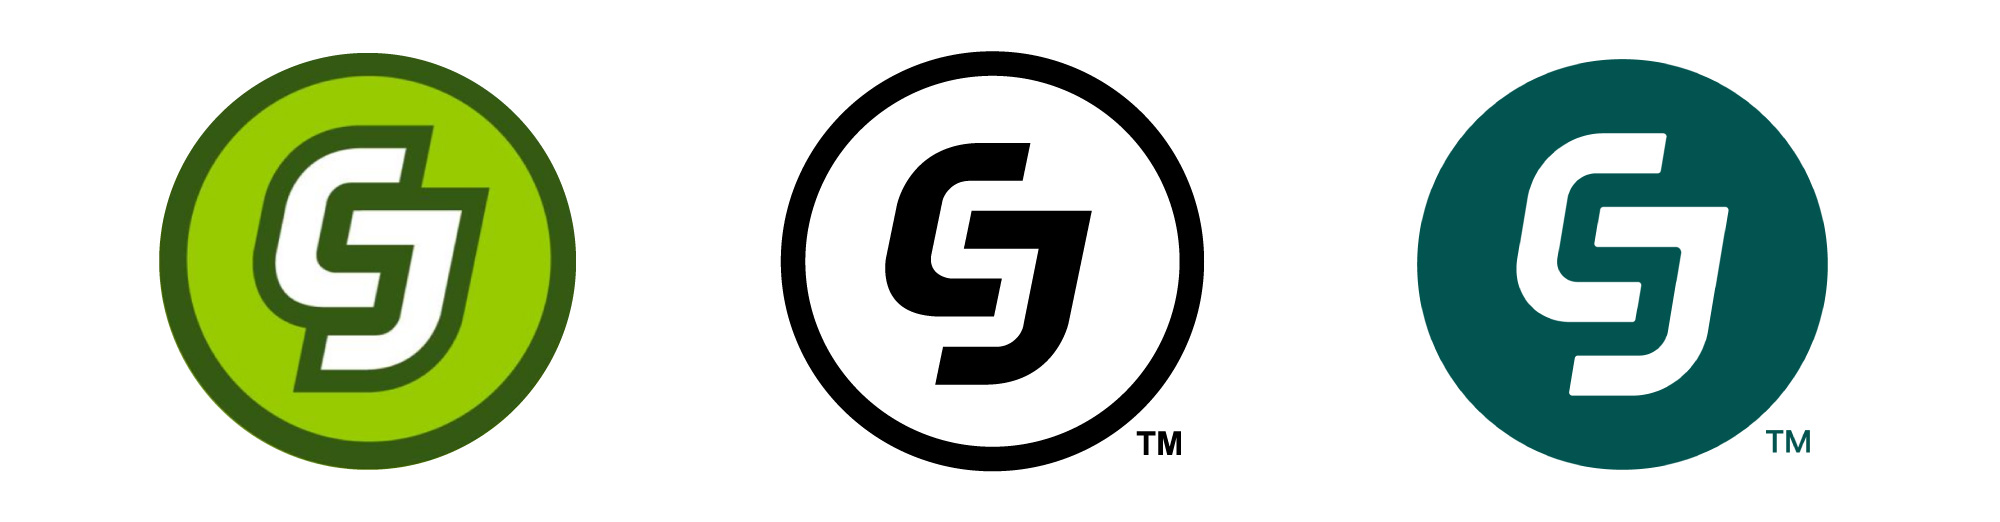 cj-affiliate-2021-brand-refresh-logos-FINAL